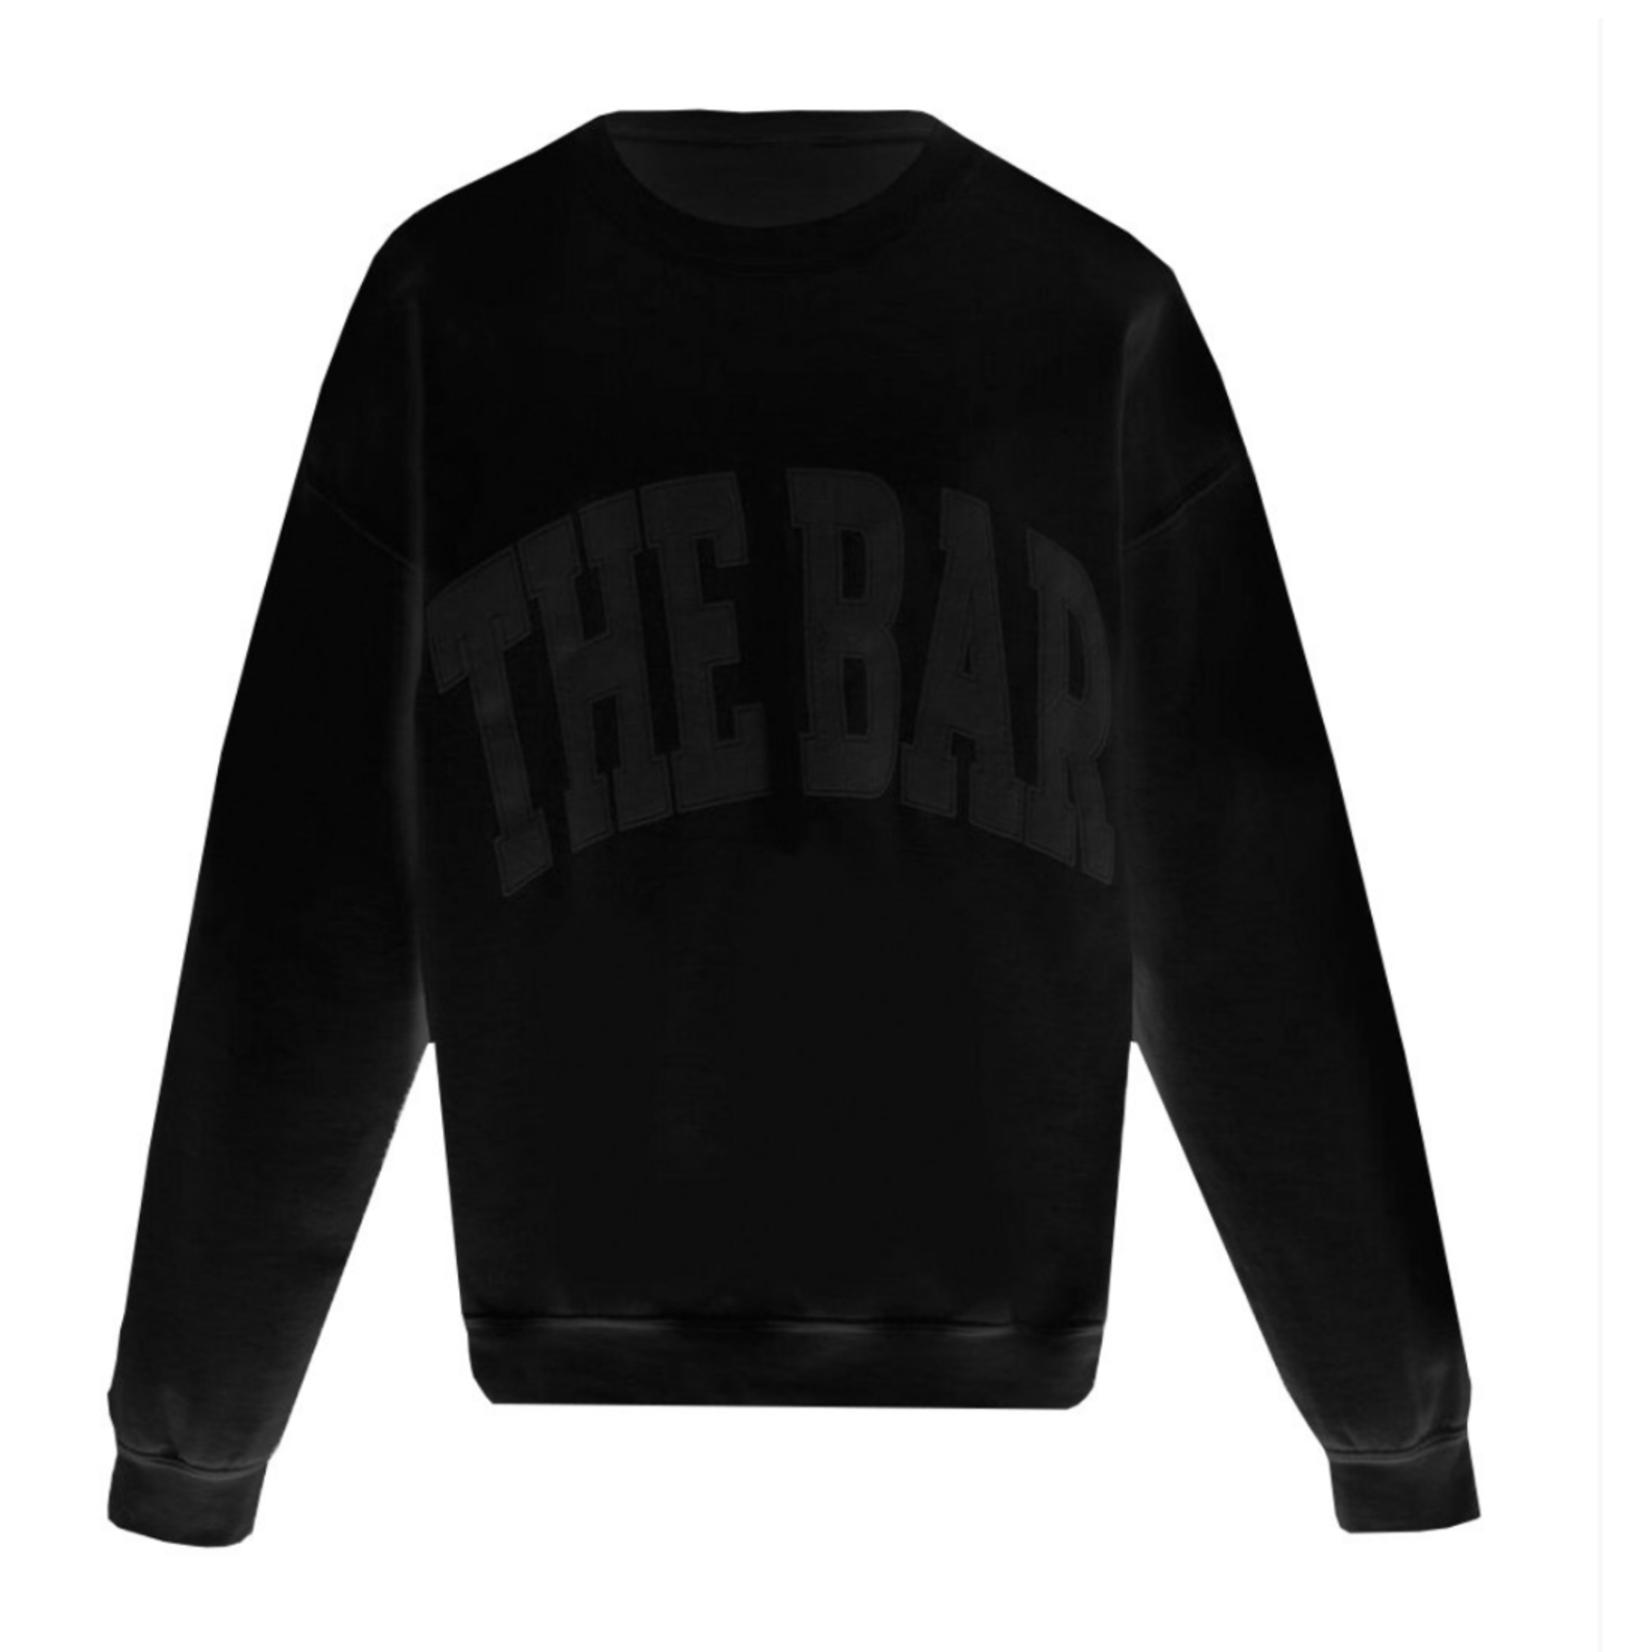 The Bar The Bar Black Hoodie